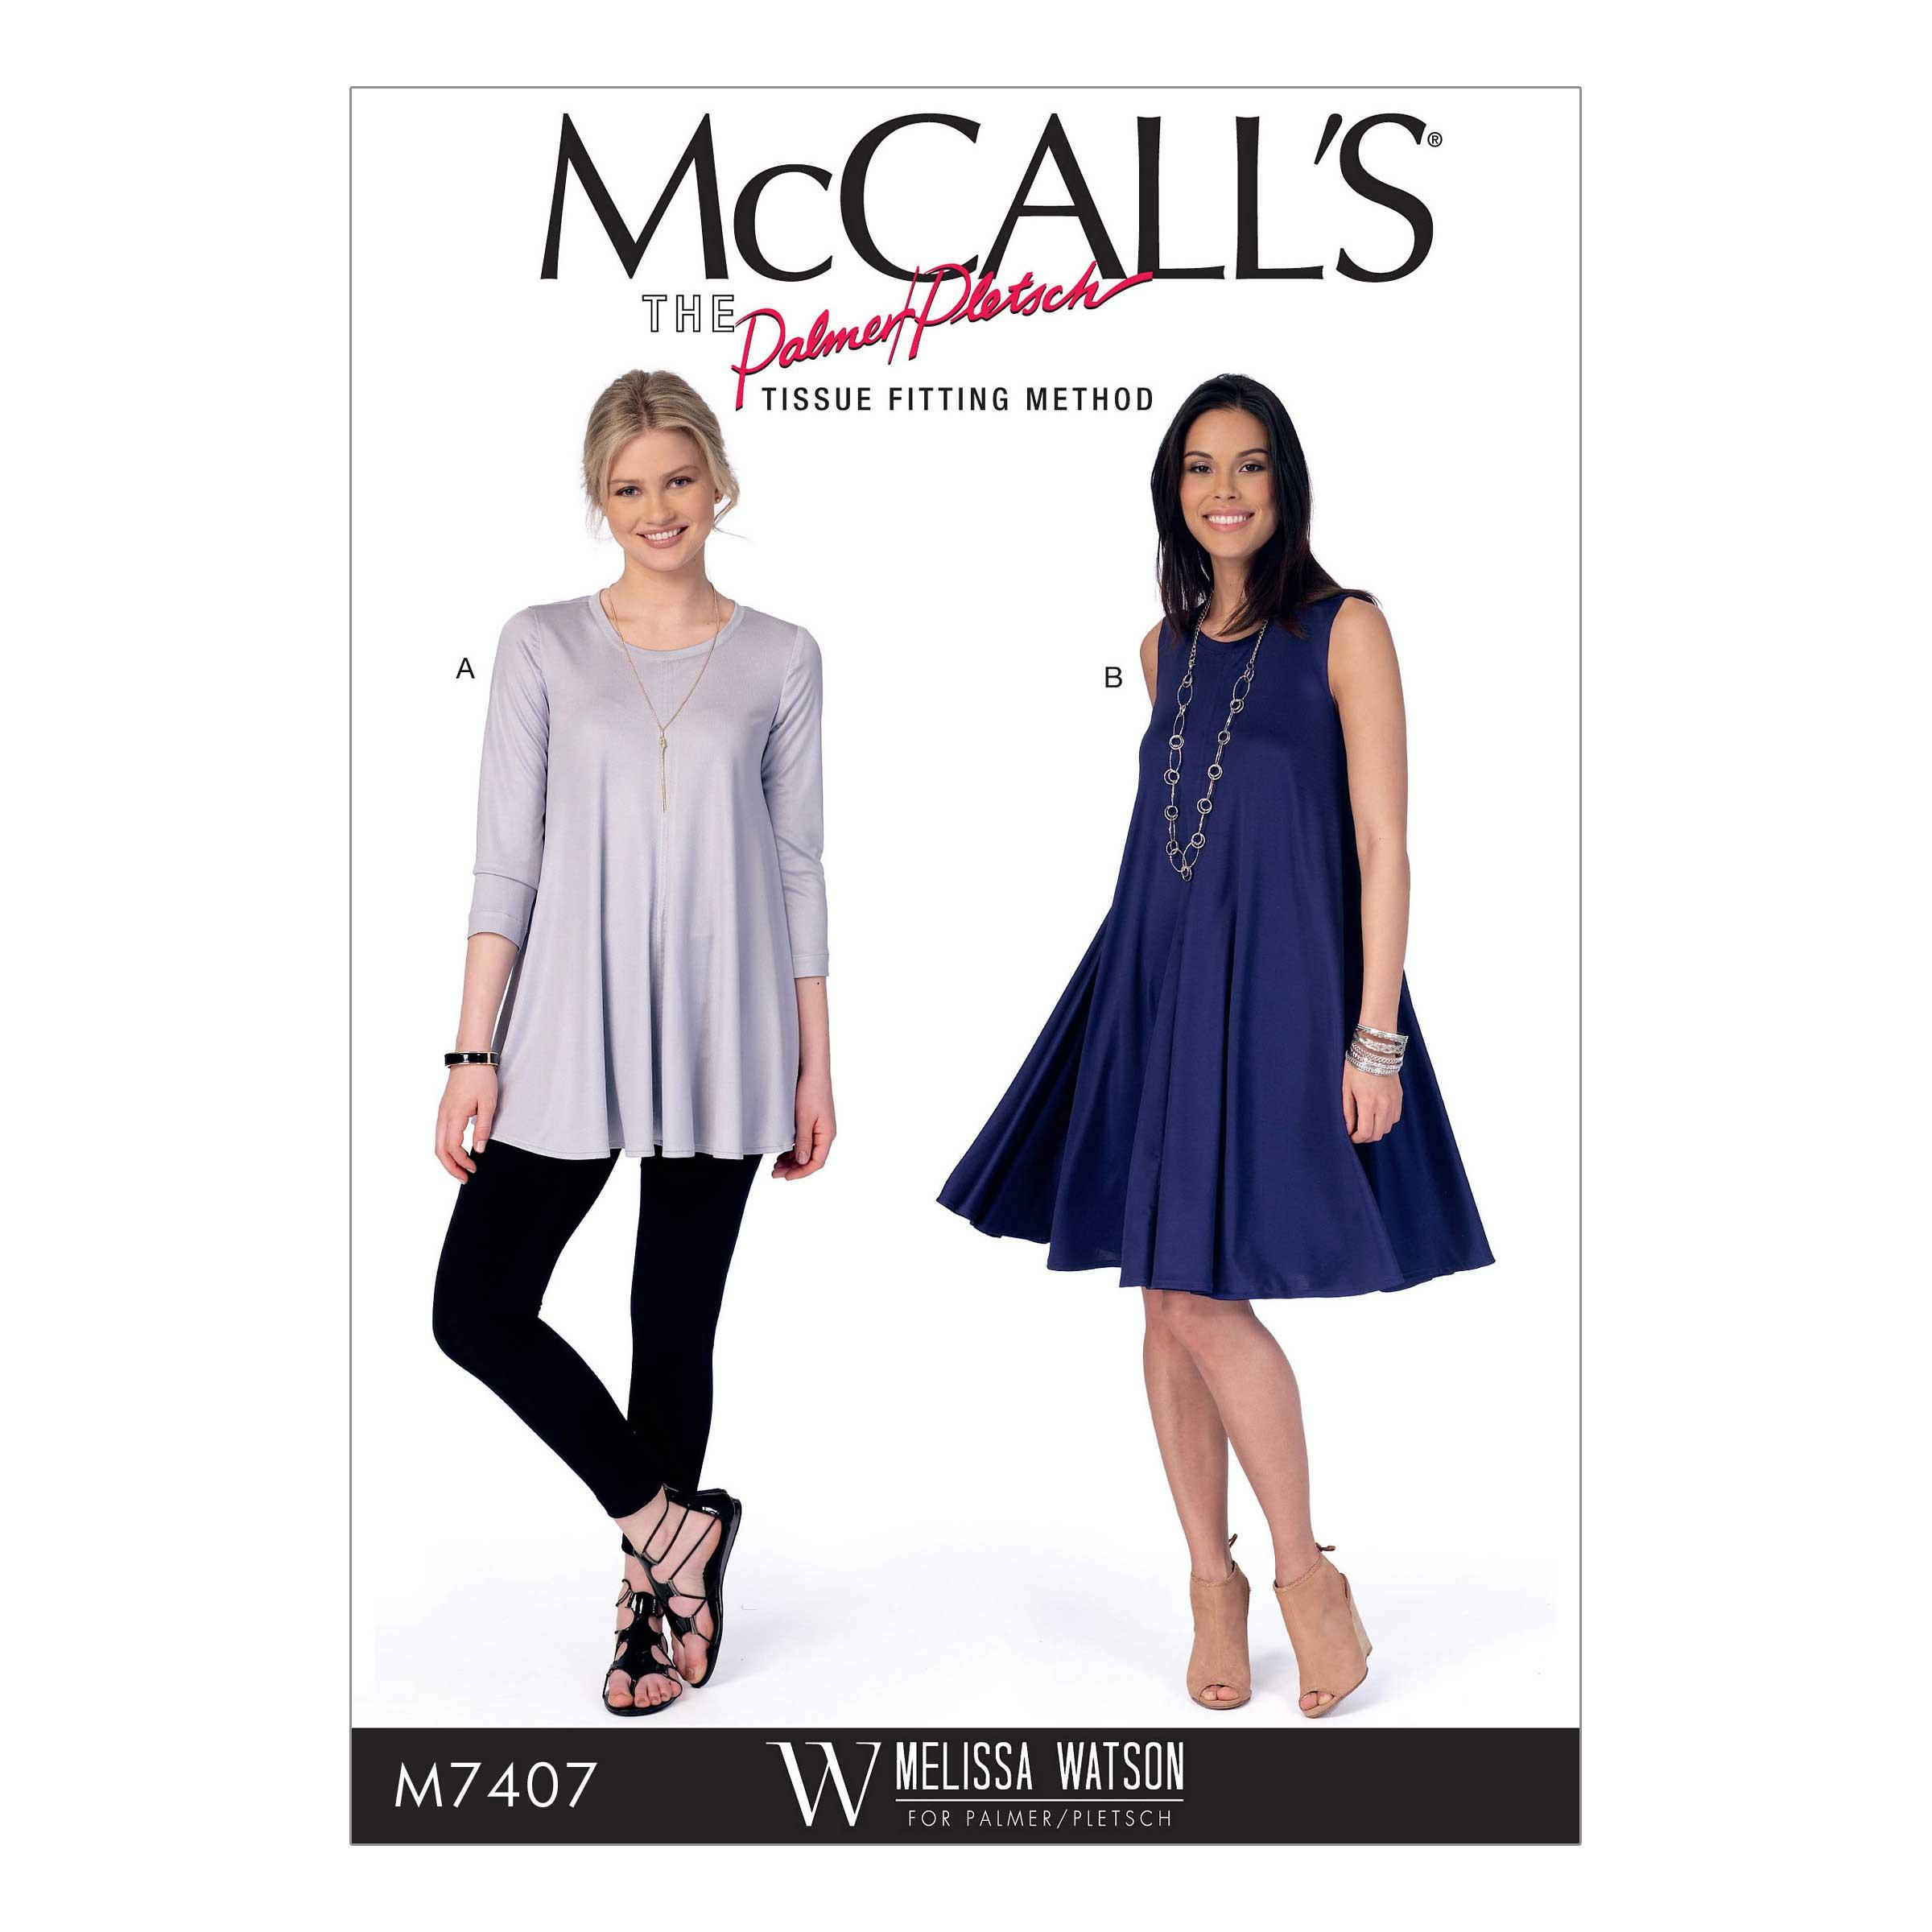 Holm Sown: McCalls M7407 - Melissa Watson swing tee sewing pattern